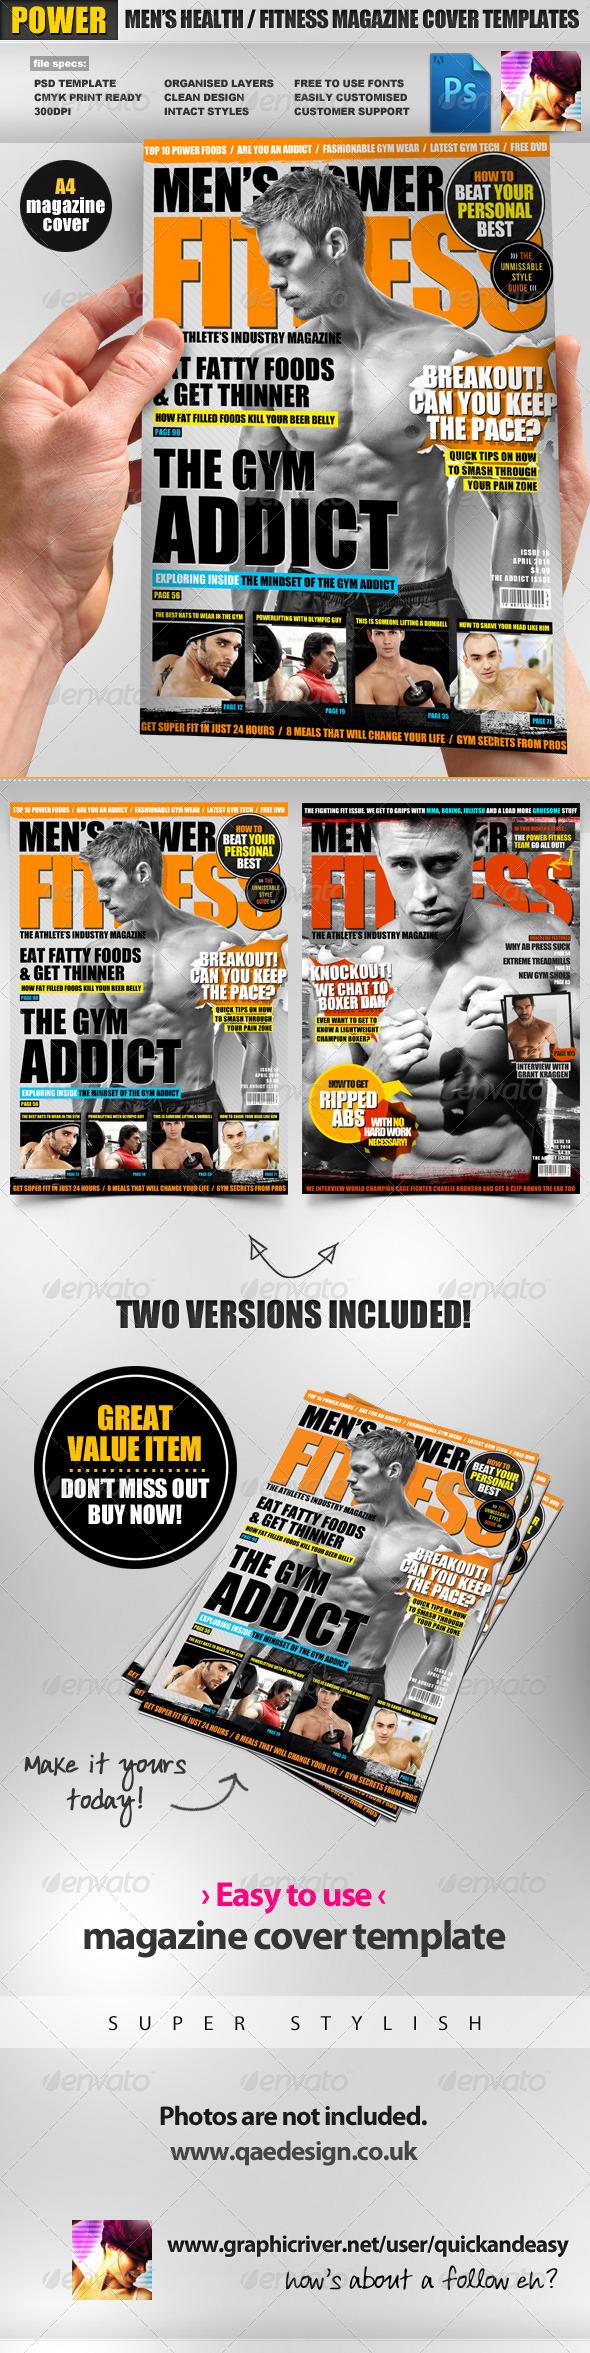 GraphicRiver Men s Power Fitness Magazine Cover Template 2430797